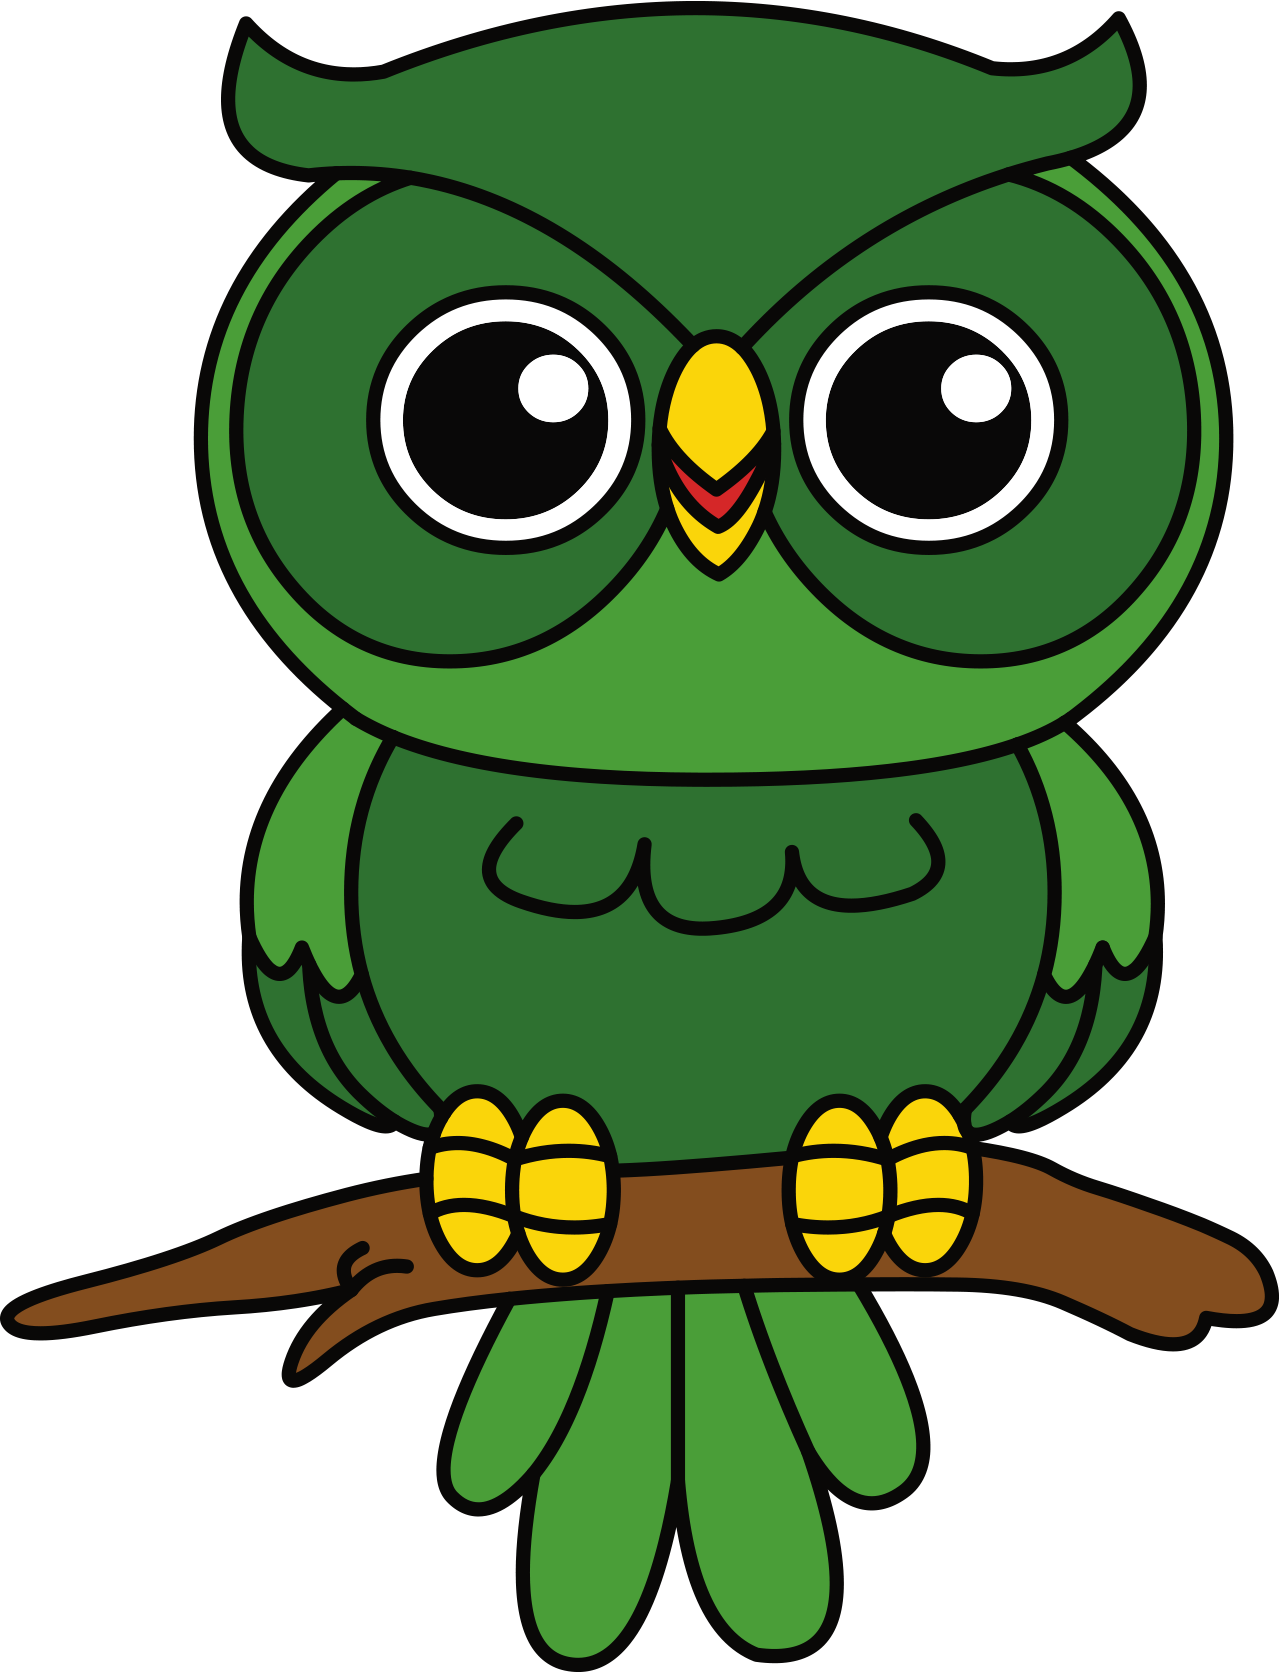 buhos imprimibles de colores pinterest owl and rh pinterest com Night Owl Cartoon Easy Night Owl Clip Art Black and White